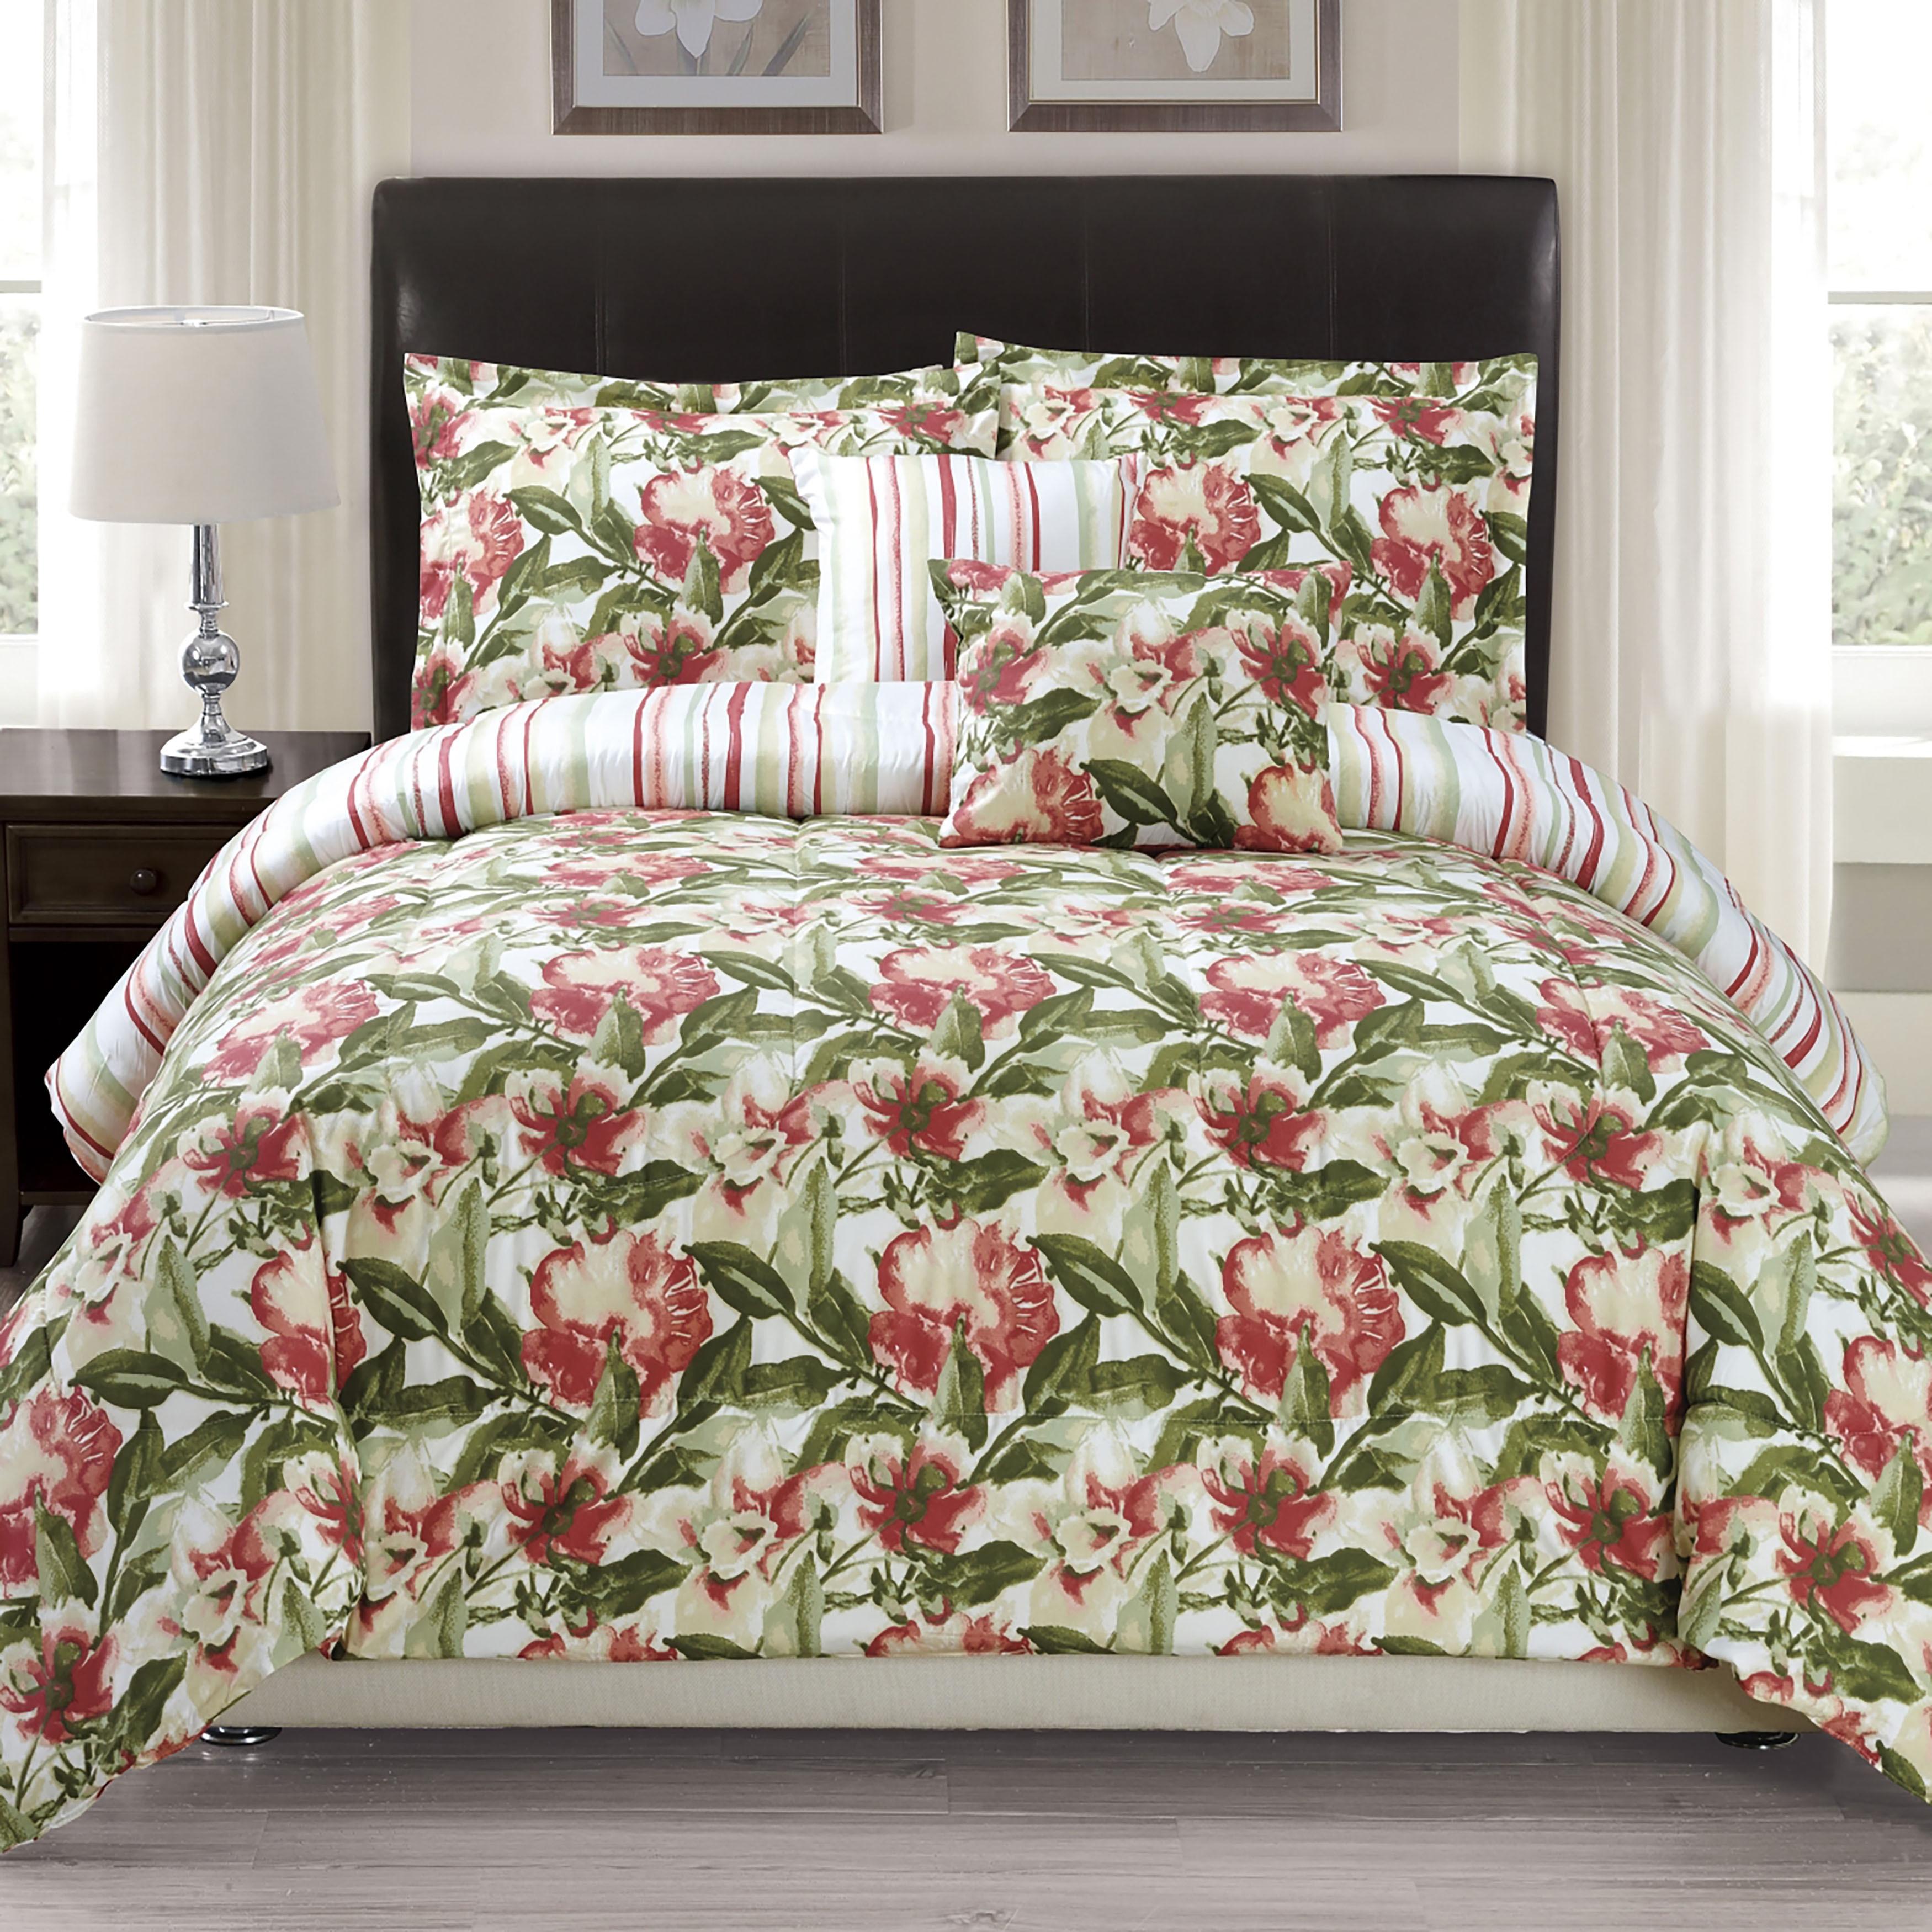 Panama Jack Orchid Grace 5-piece Comforter Set (King), Gr...